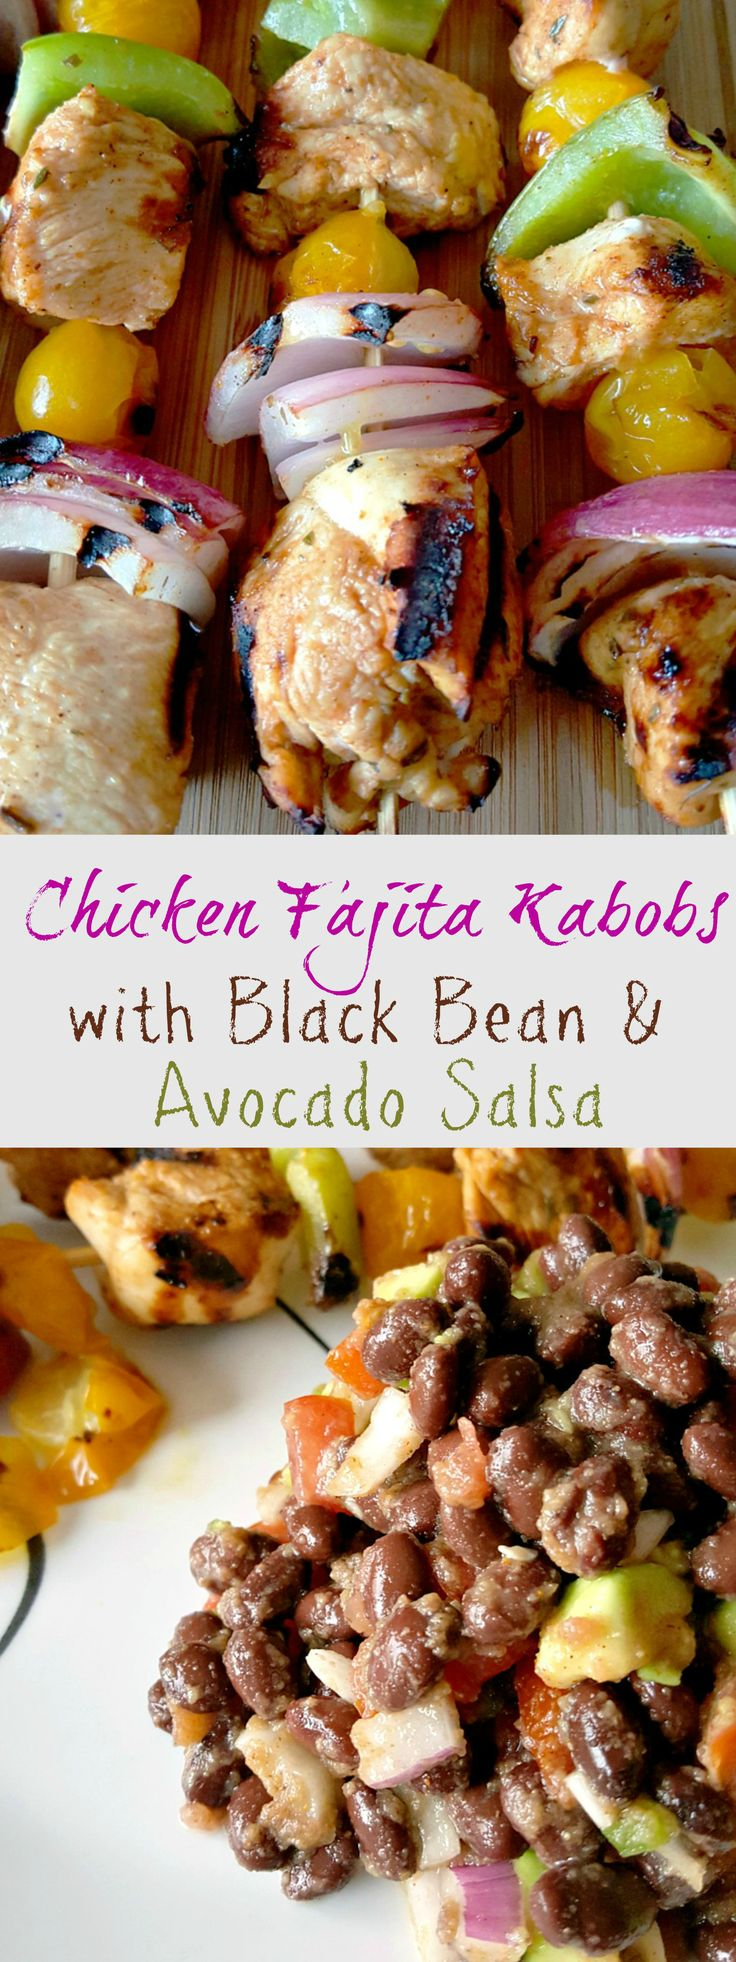 Chicken Fajita Kabobs - Taste just like my favorite restaurant fajitas!